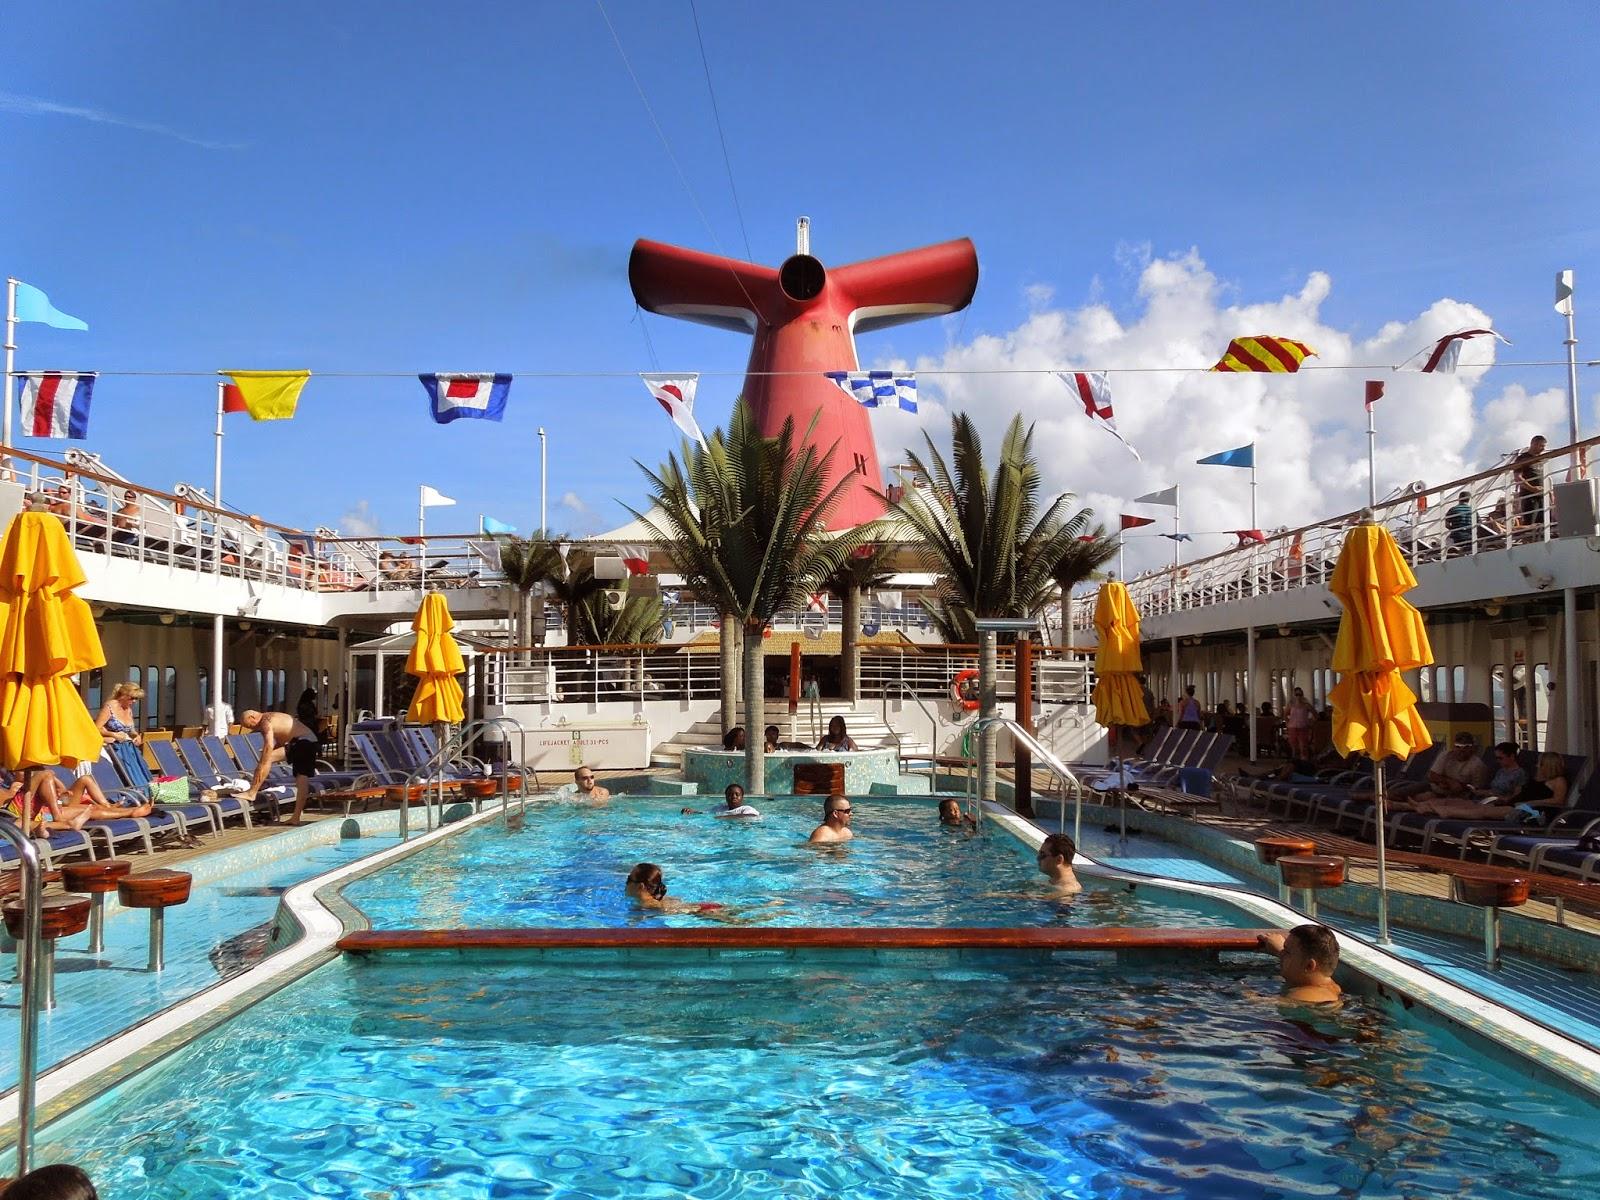 Carnival Sensation main pool